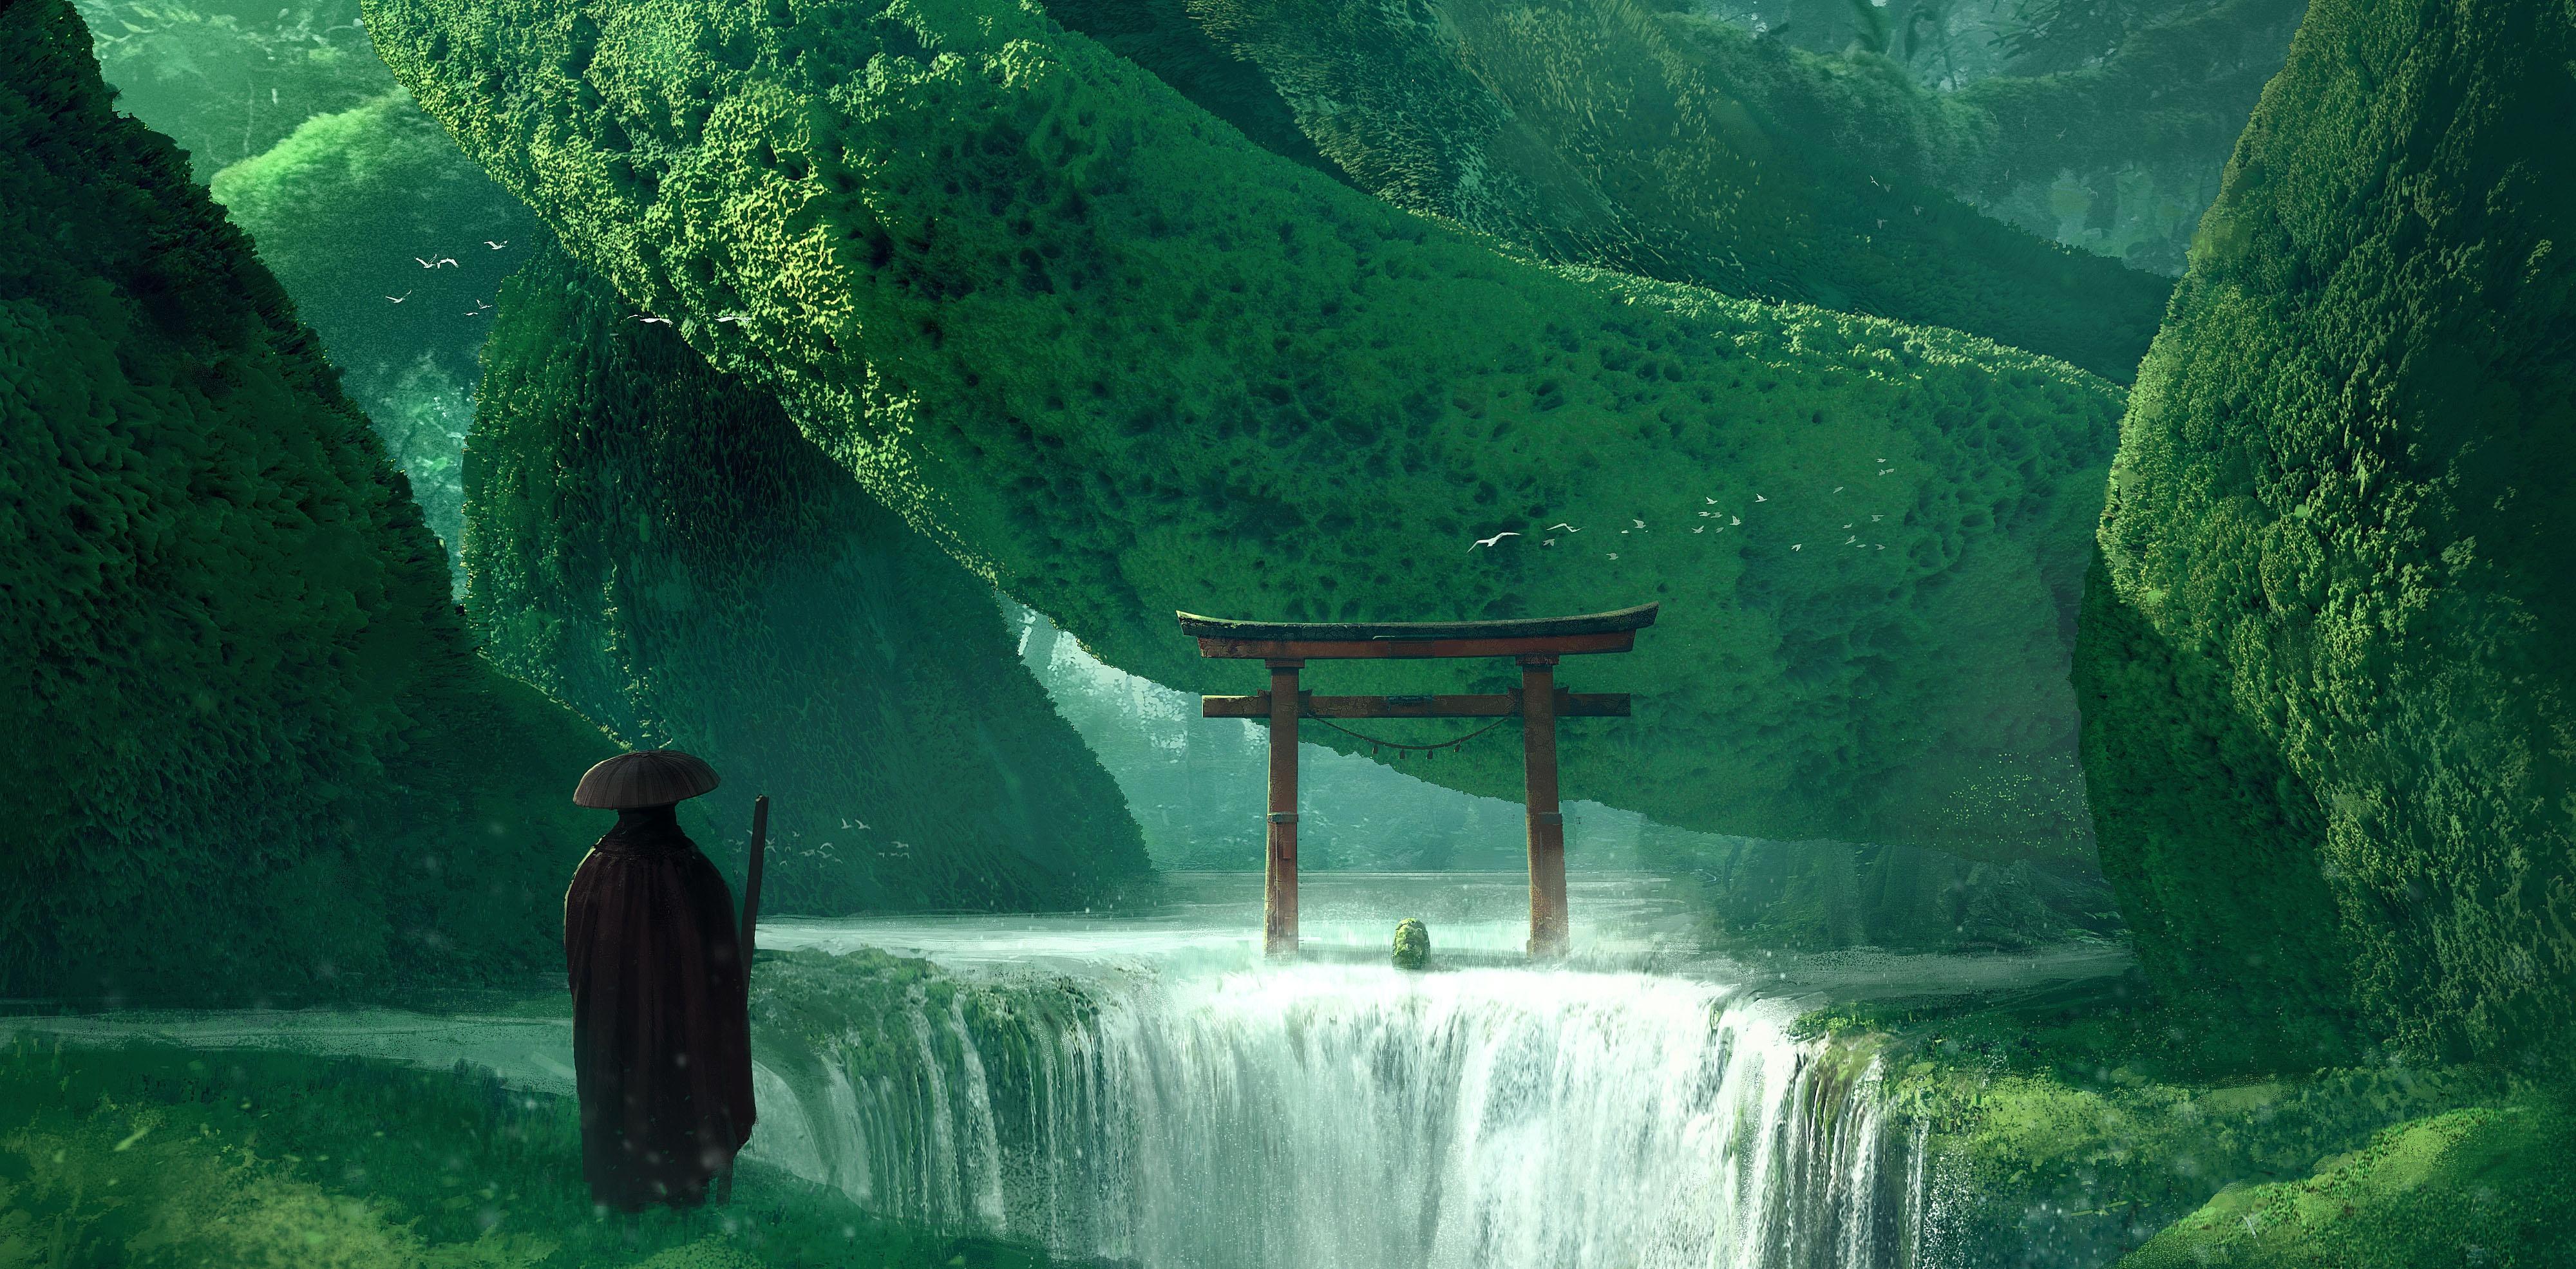 General 4000x1971 Asia nature artwork waterfall fantasy art torii green